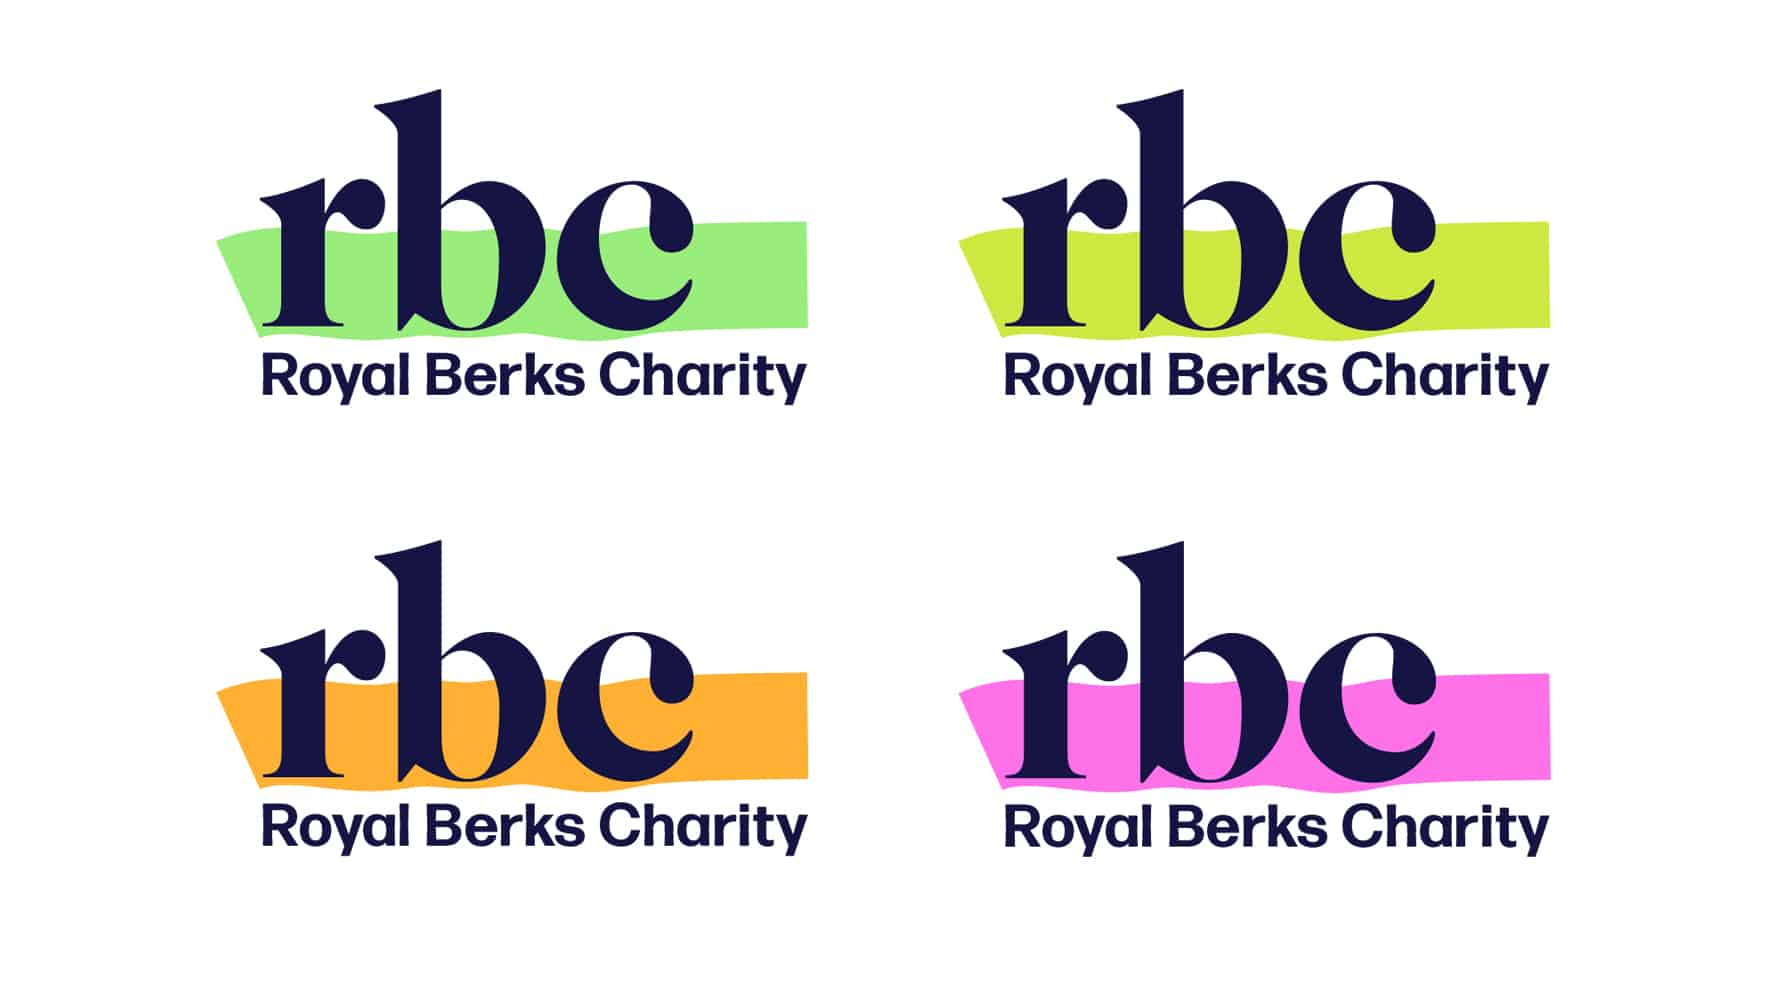 Royal Berks Charity logos